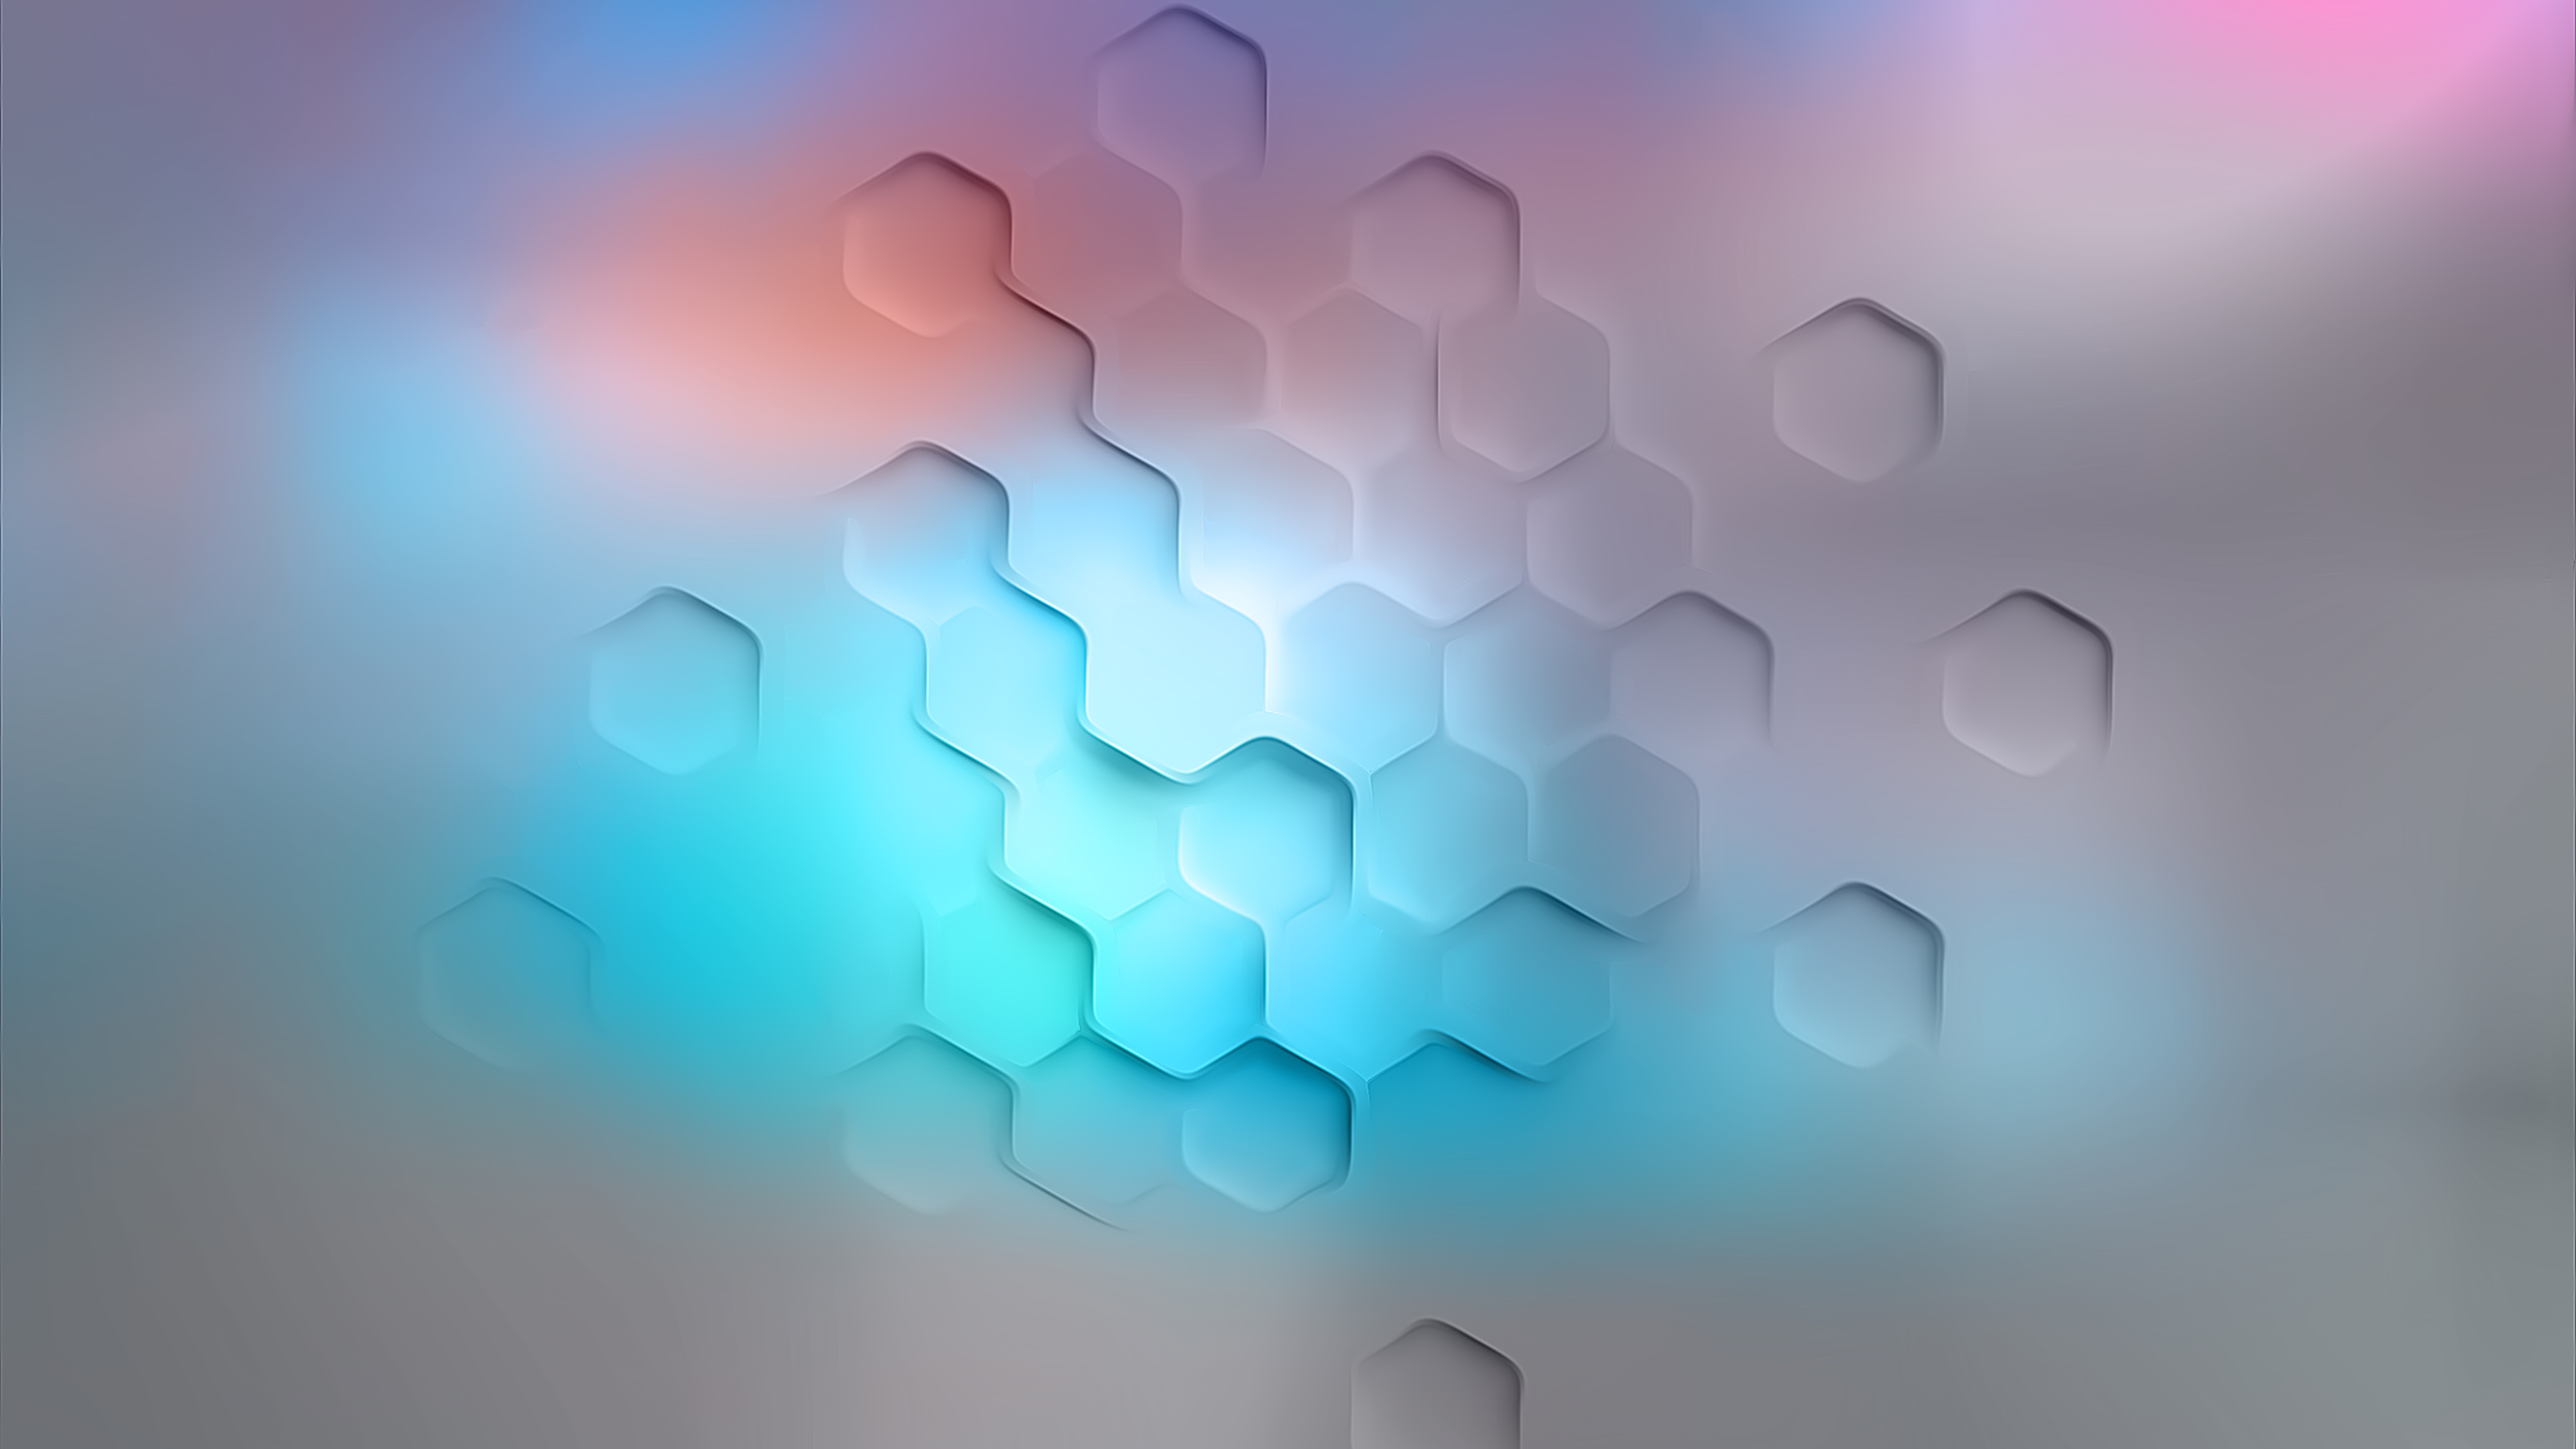 Wallpaper Polygons abstract